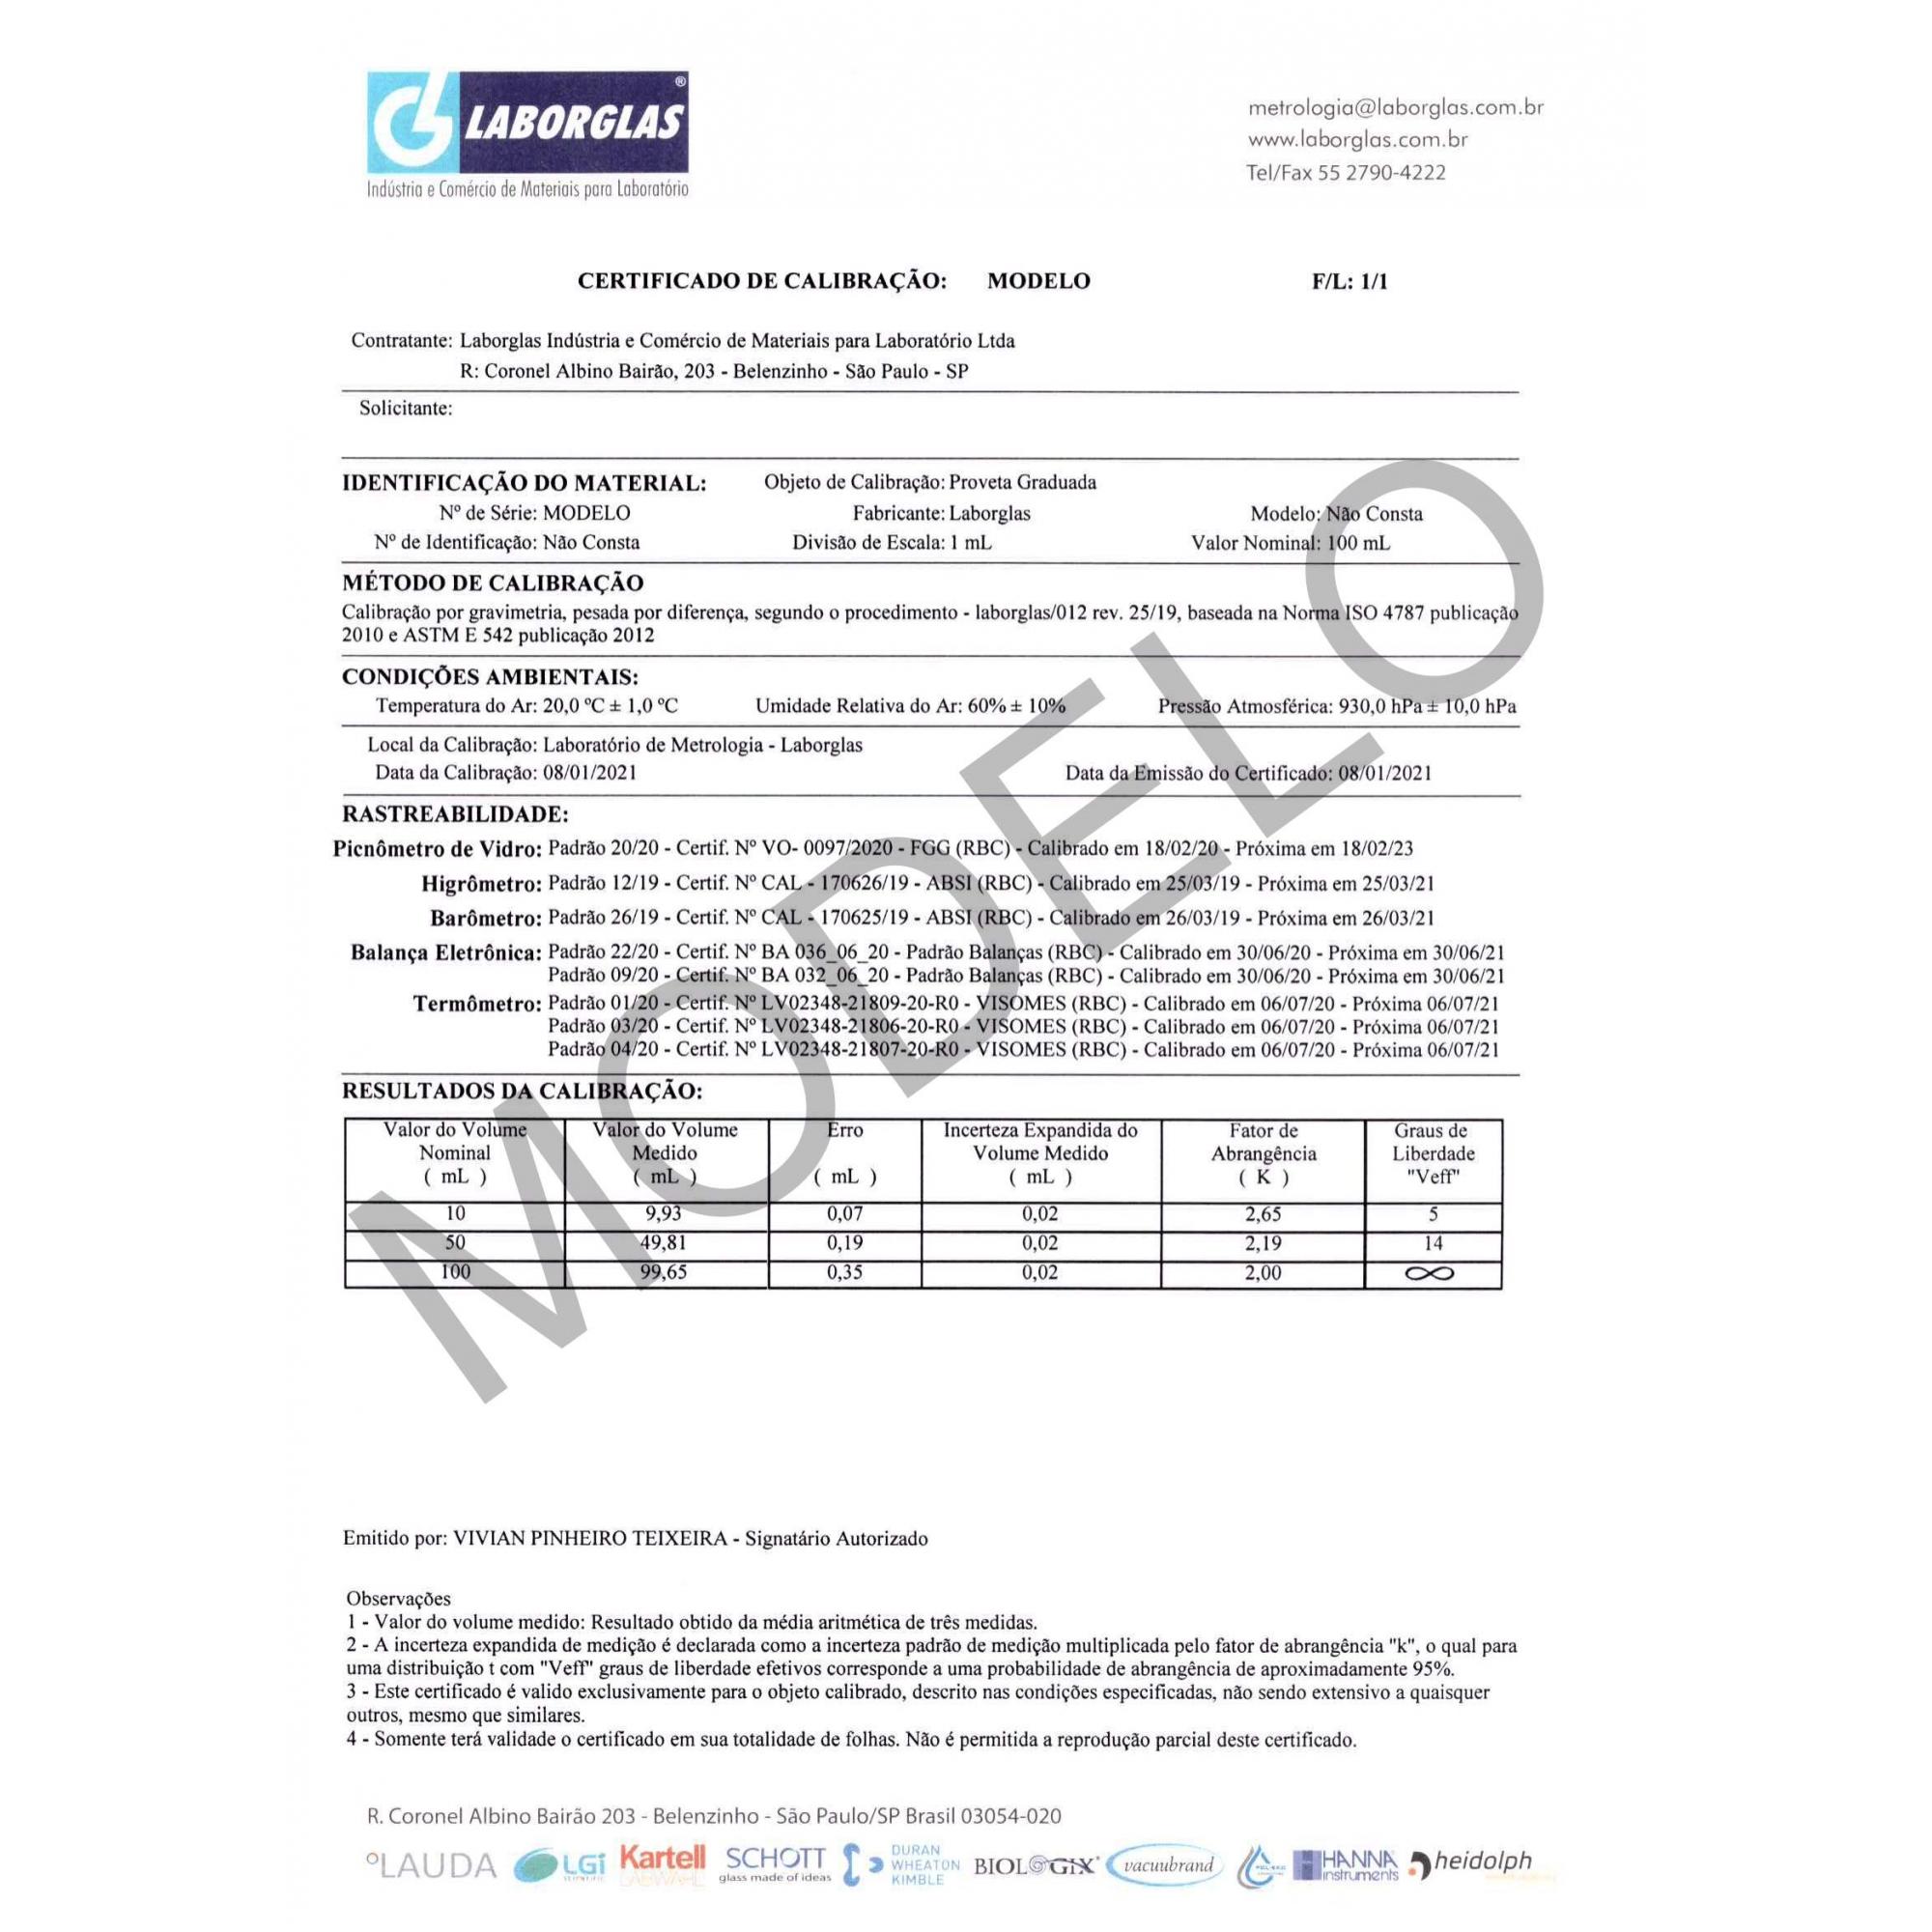 PROVETA GRADUADA BASE HEXAGONAL DE VIDRO 1000 ML CLASSE A CERTIFICADO RASTREÁVEL - Laborglas - Cód. 9139754-C